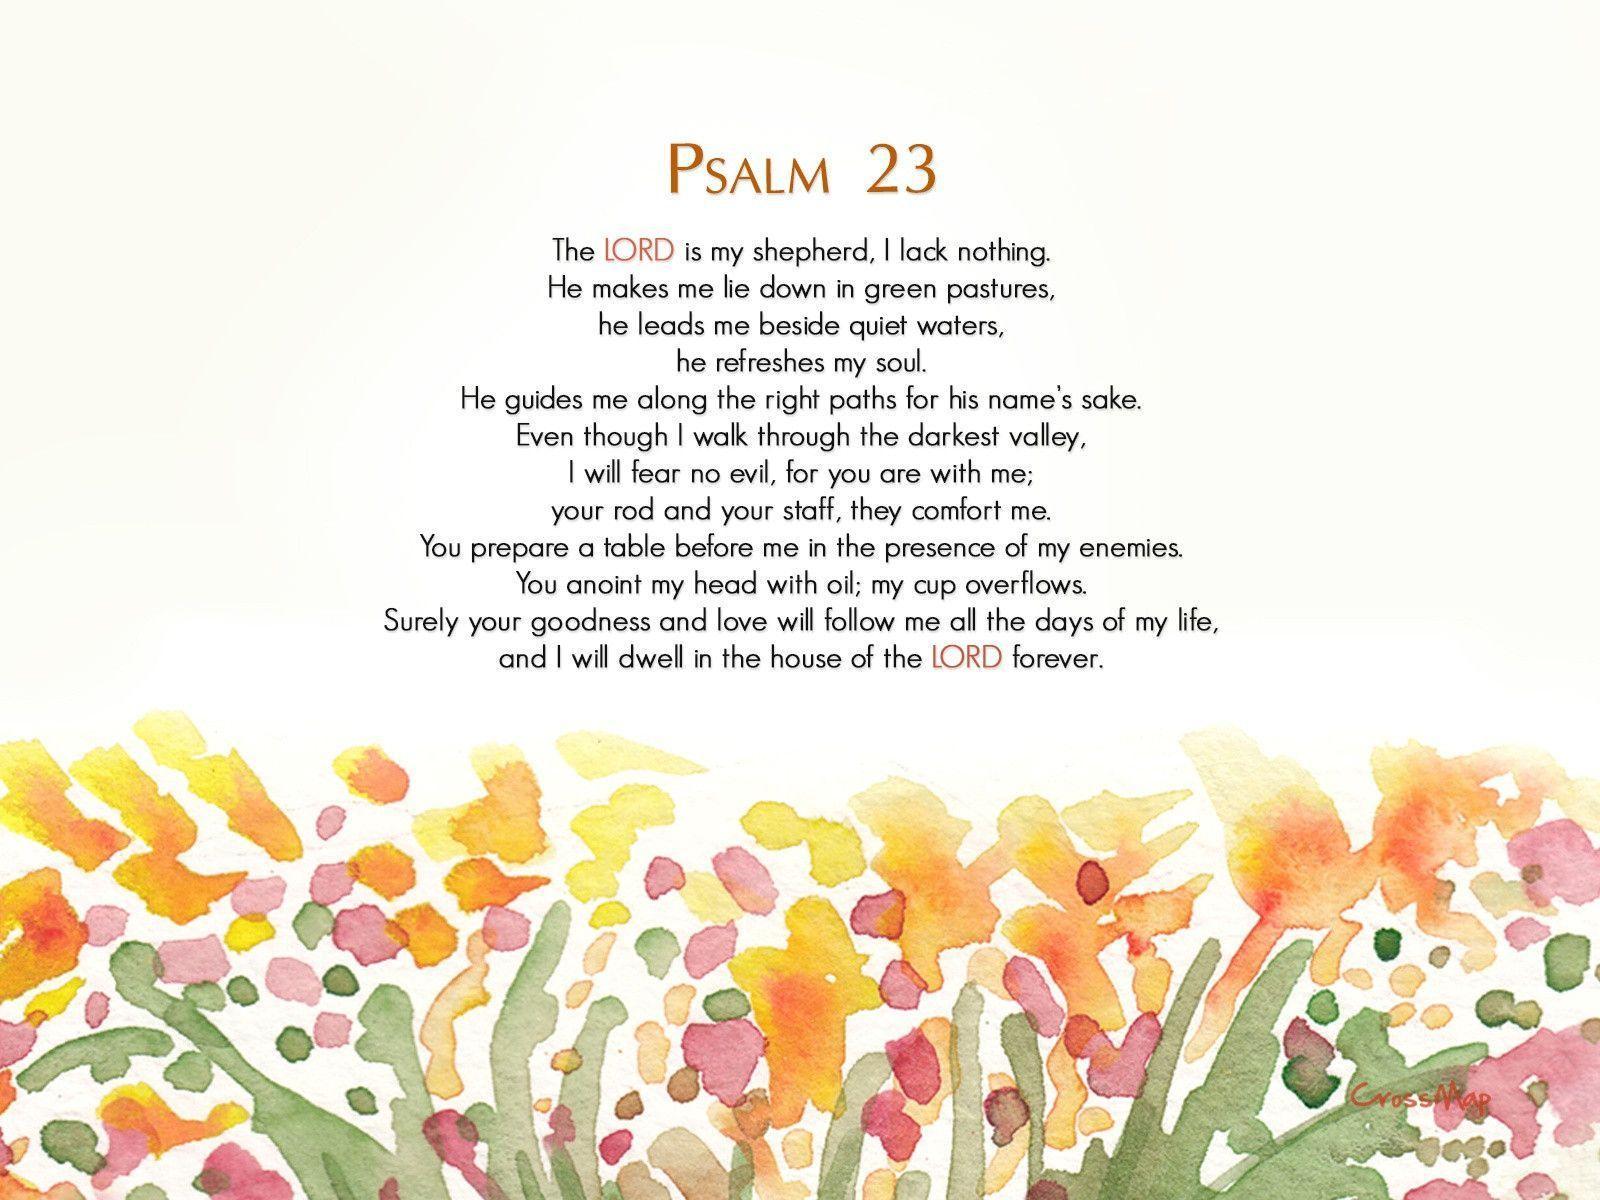 christian wallpaper psalms - photo #37